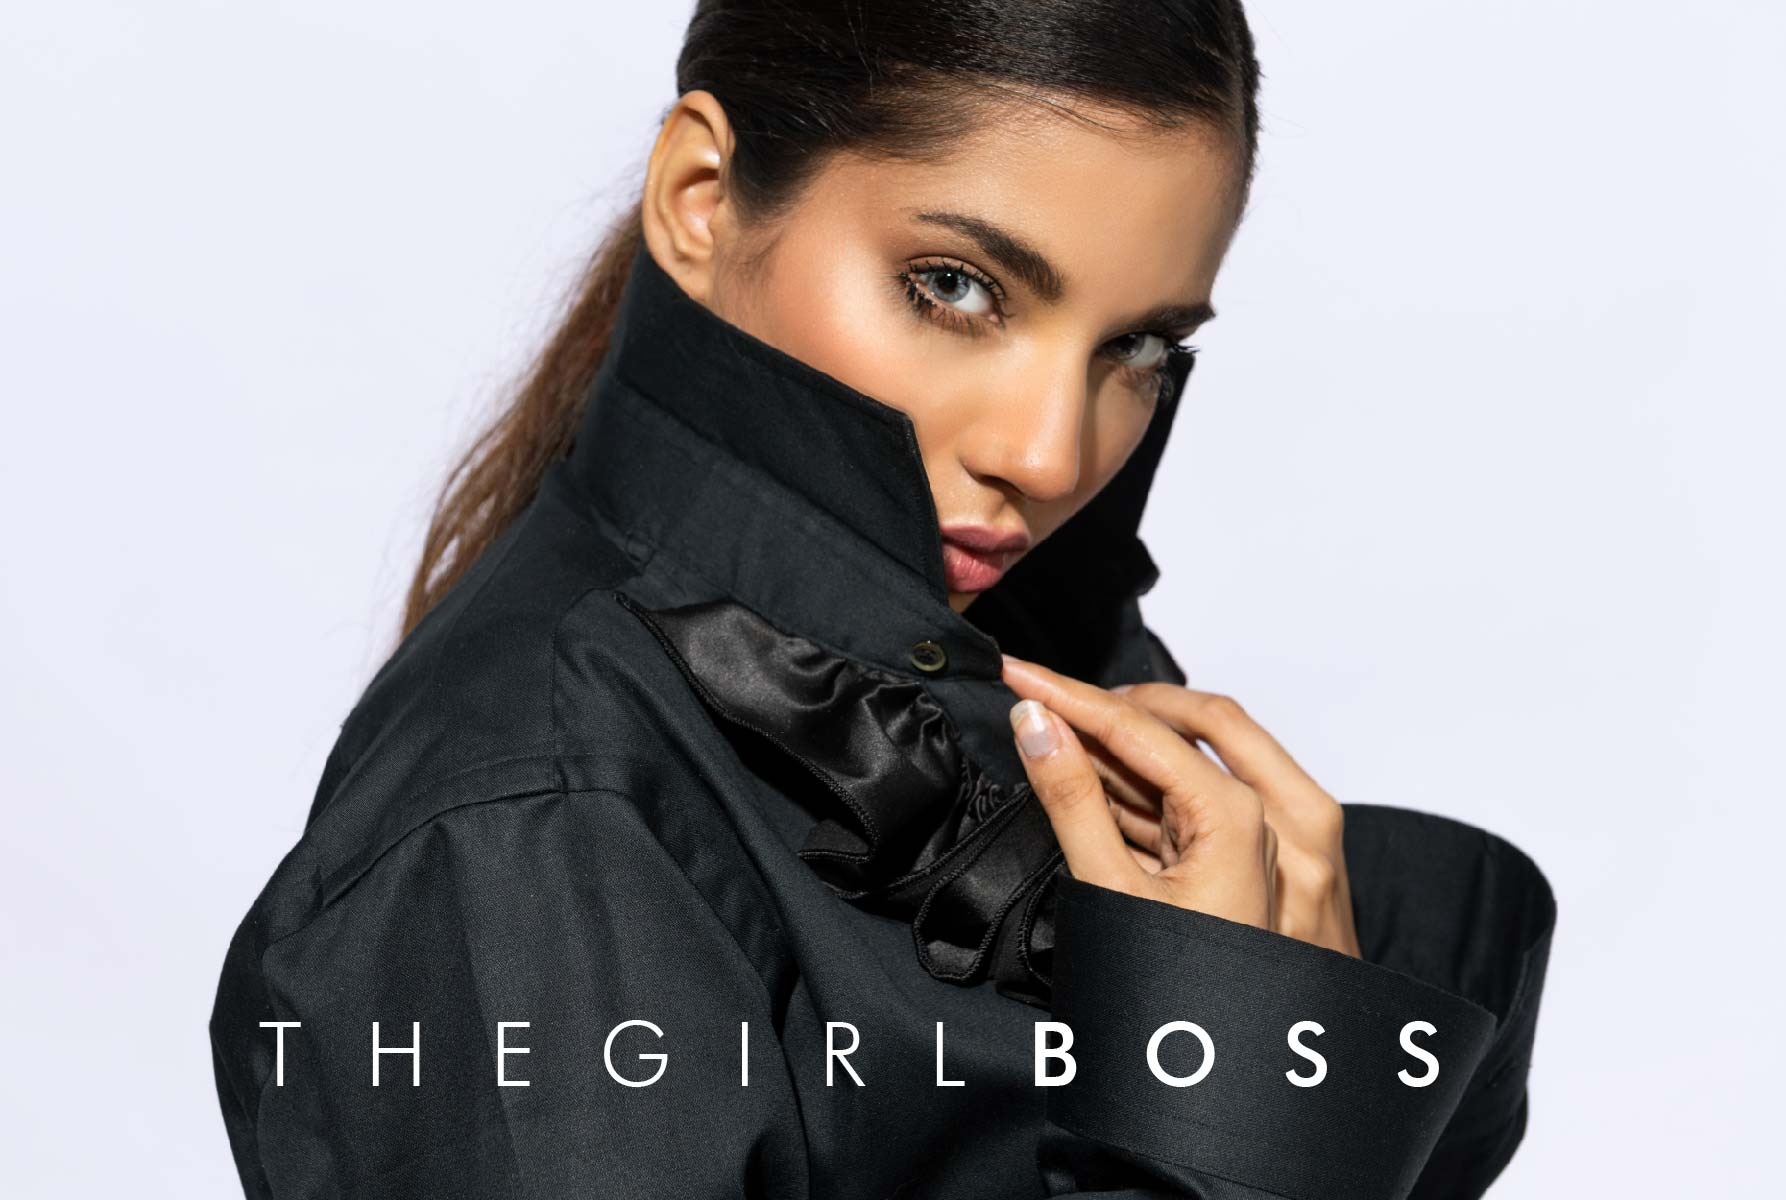 The Girl Boss - Sawaira Sheikh